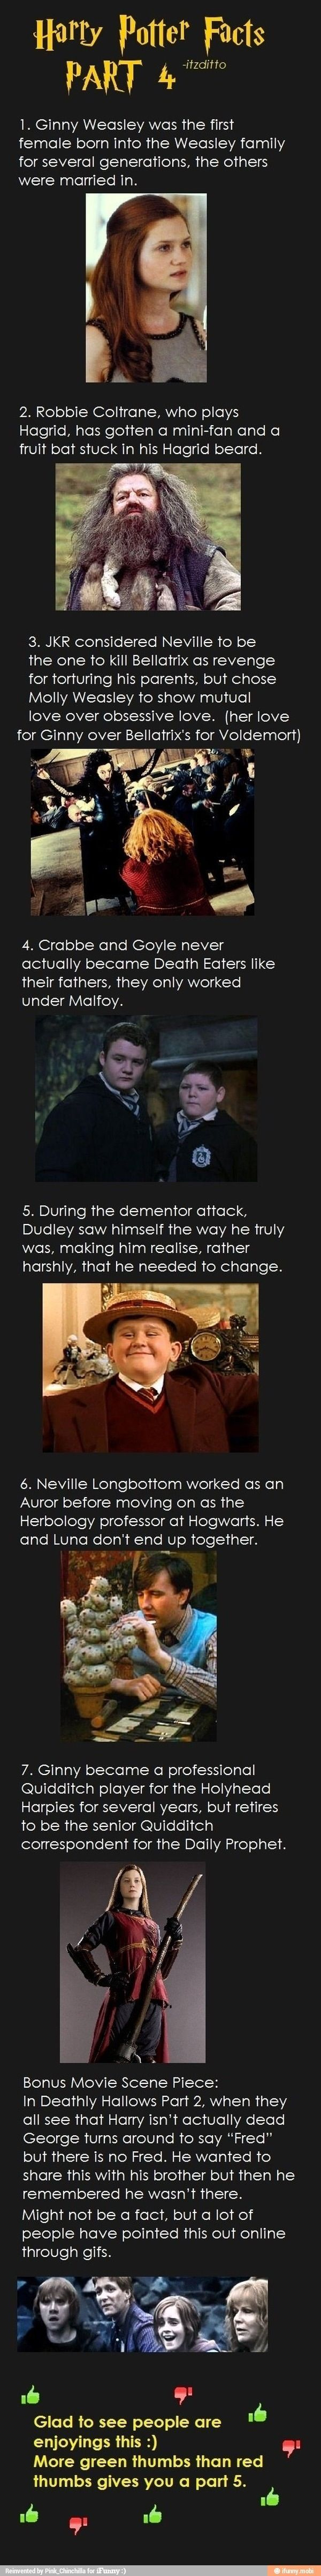 Harry Potter Fact 4!: